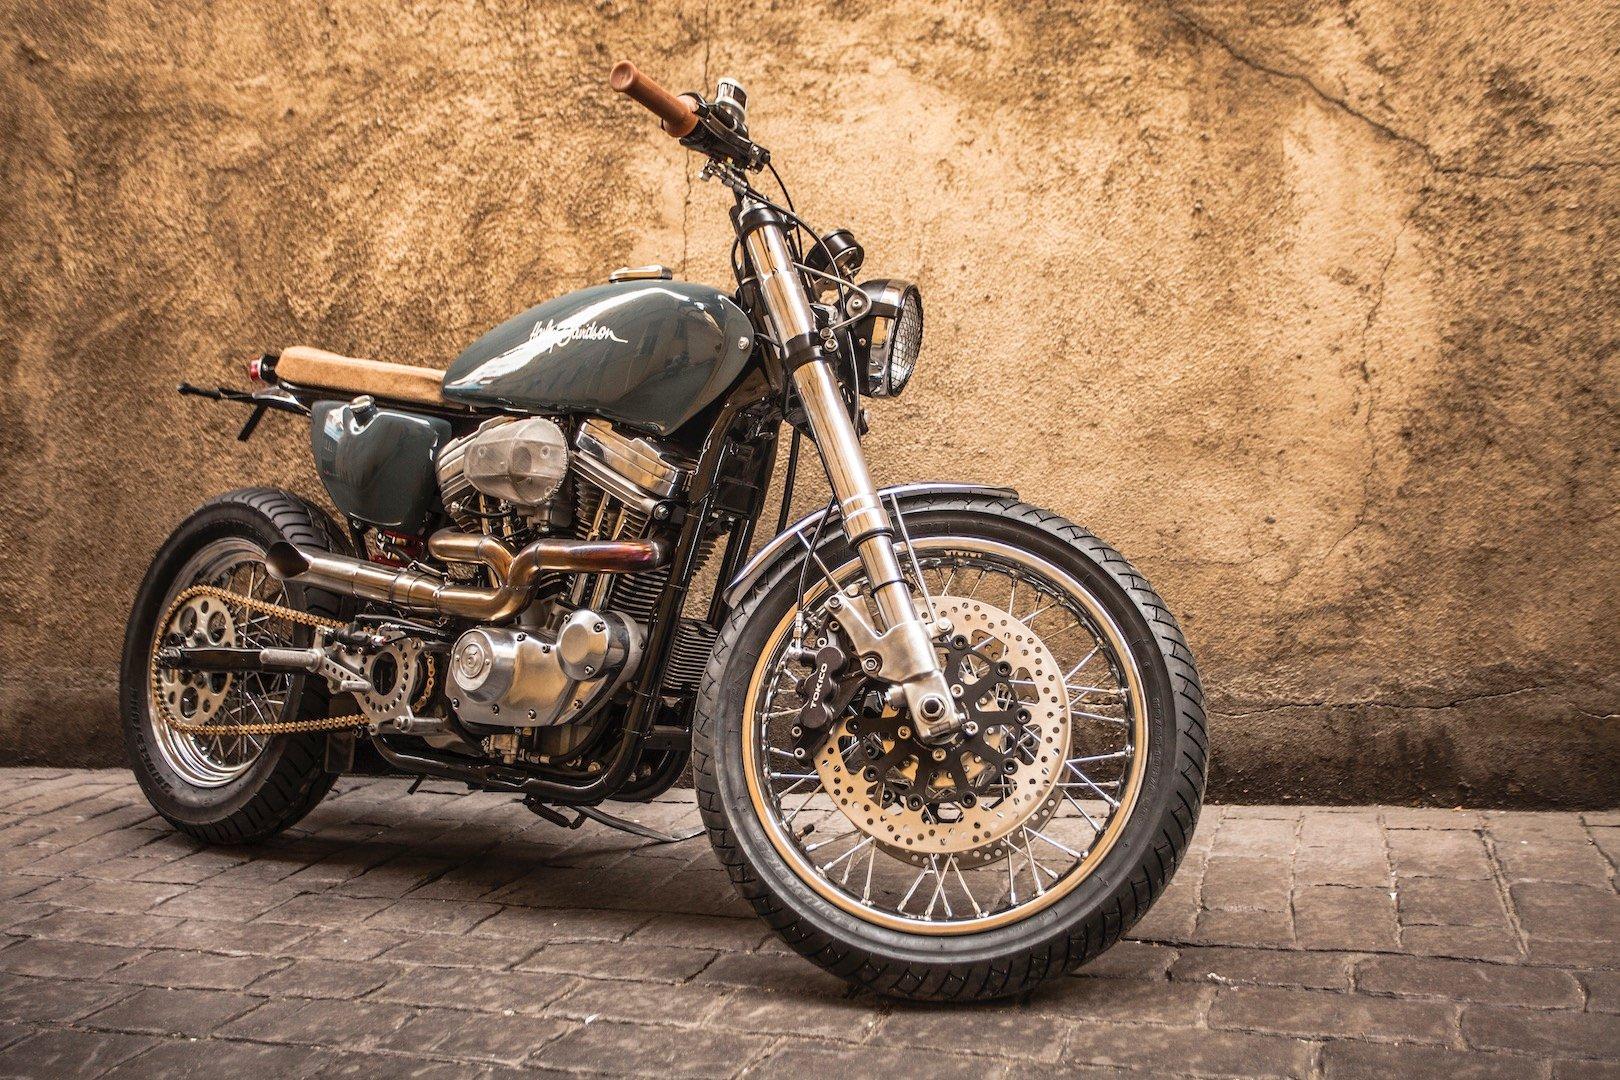 XTR Pepo 1992 Harley-Davidson Sportster XLH883 Custom Motorcycle